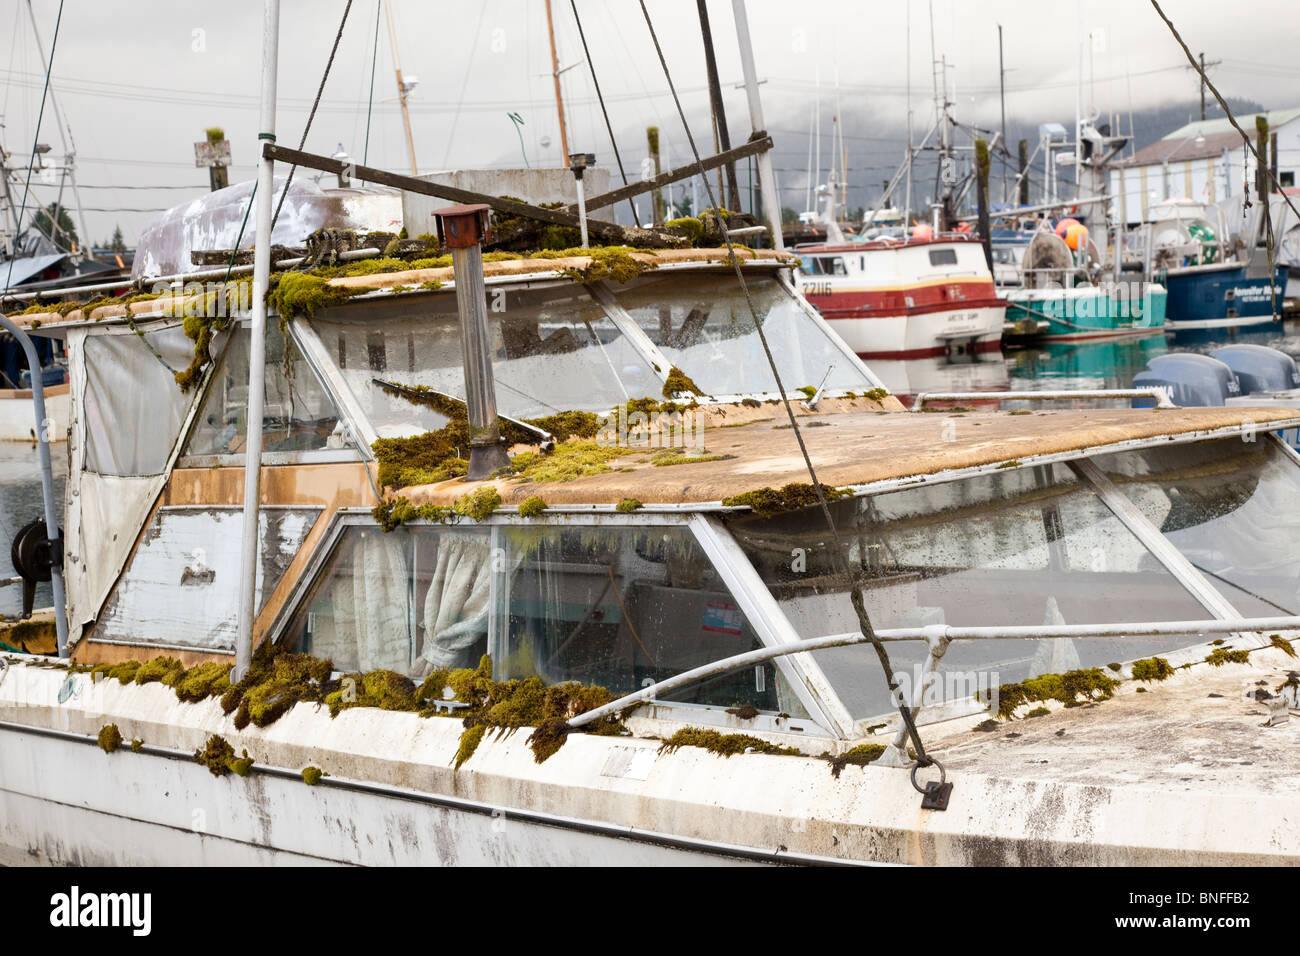 USA; Alaska; Petersburg; neglected boat - Stock Image